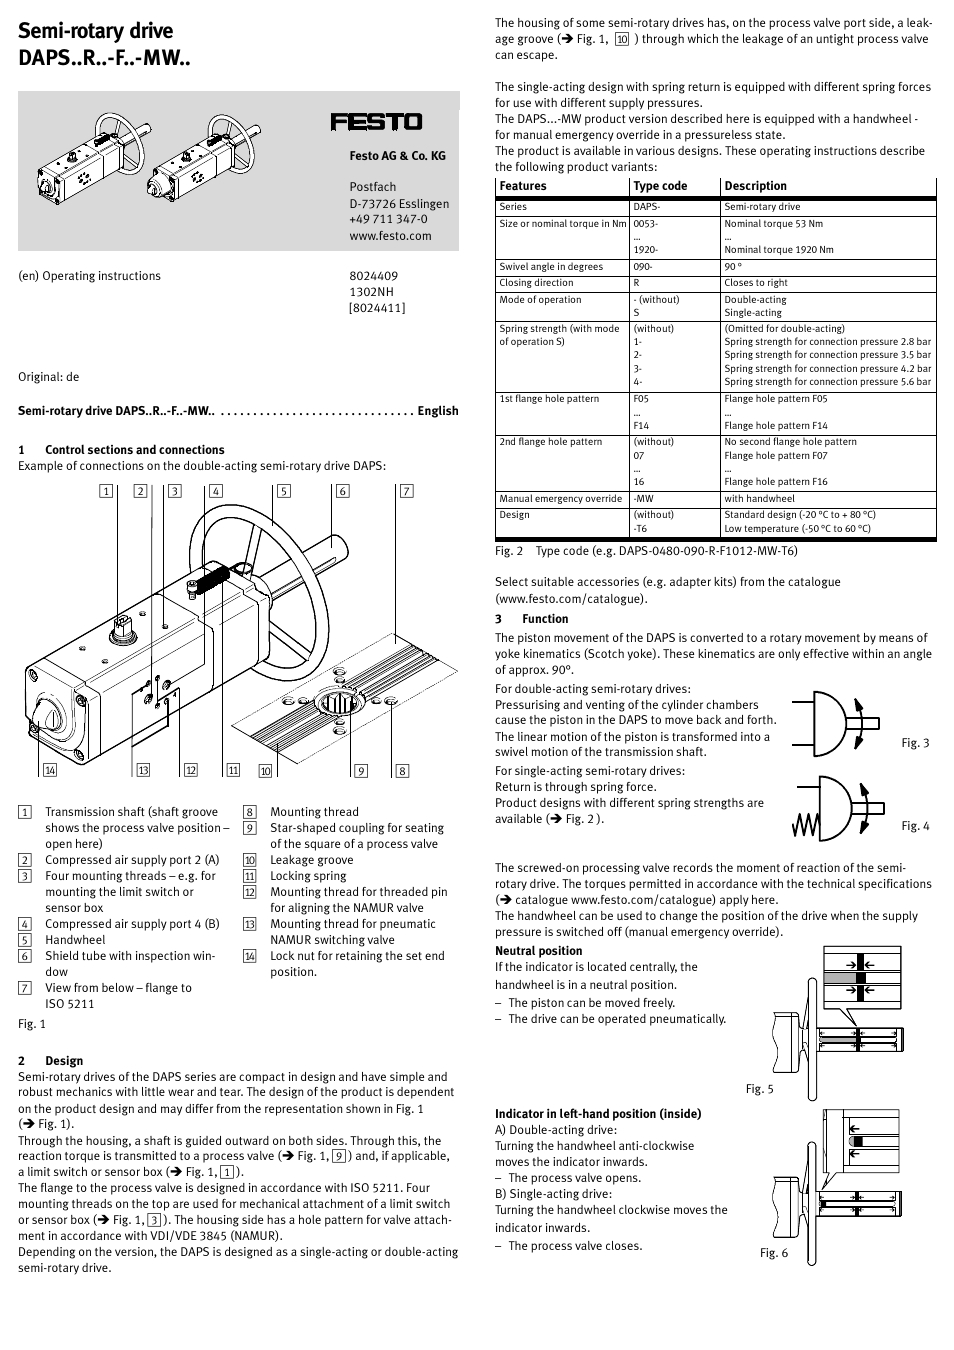 medium resolution of festo daps r f mw user manual 5 pages festo valve limit switch festo limit switch wire diagram 2